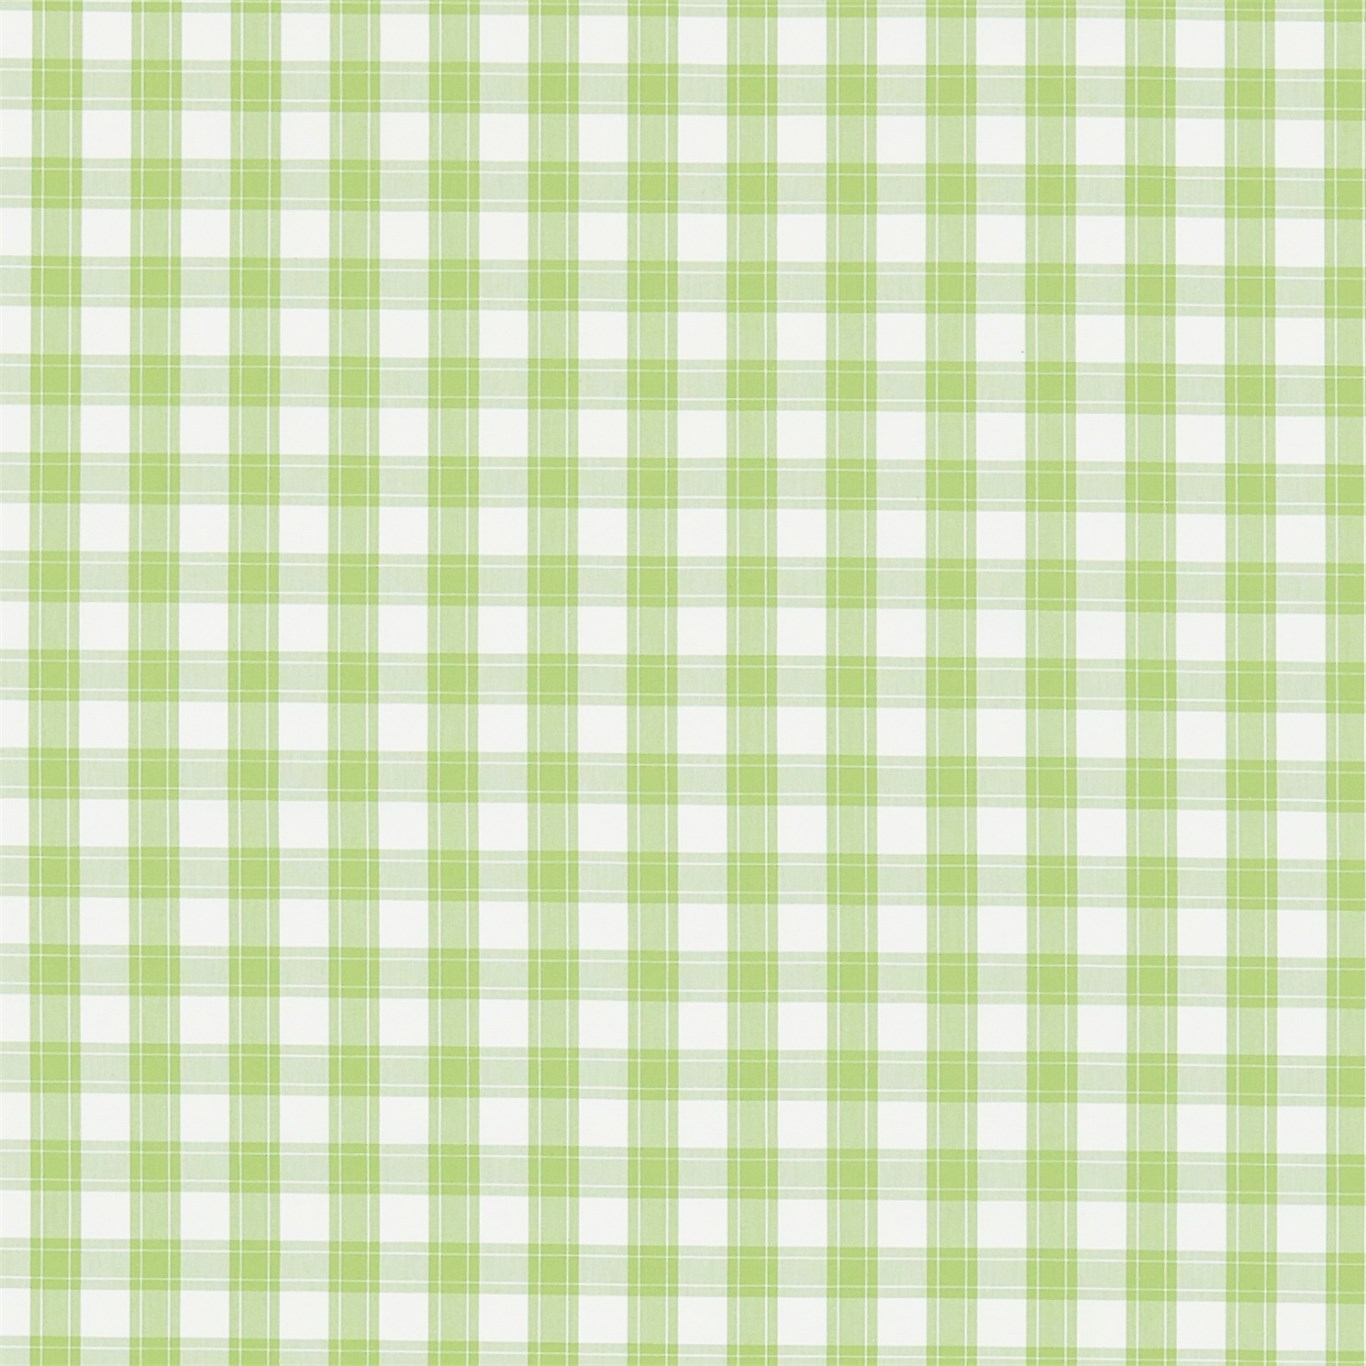 Appledore Grön